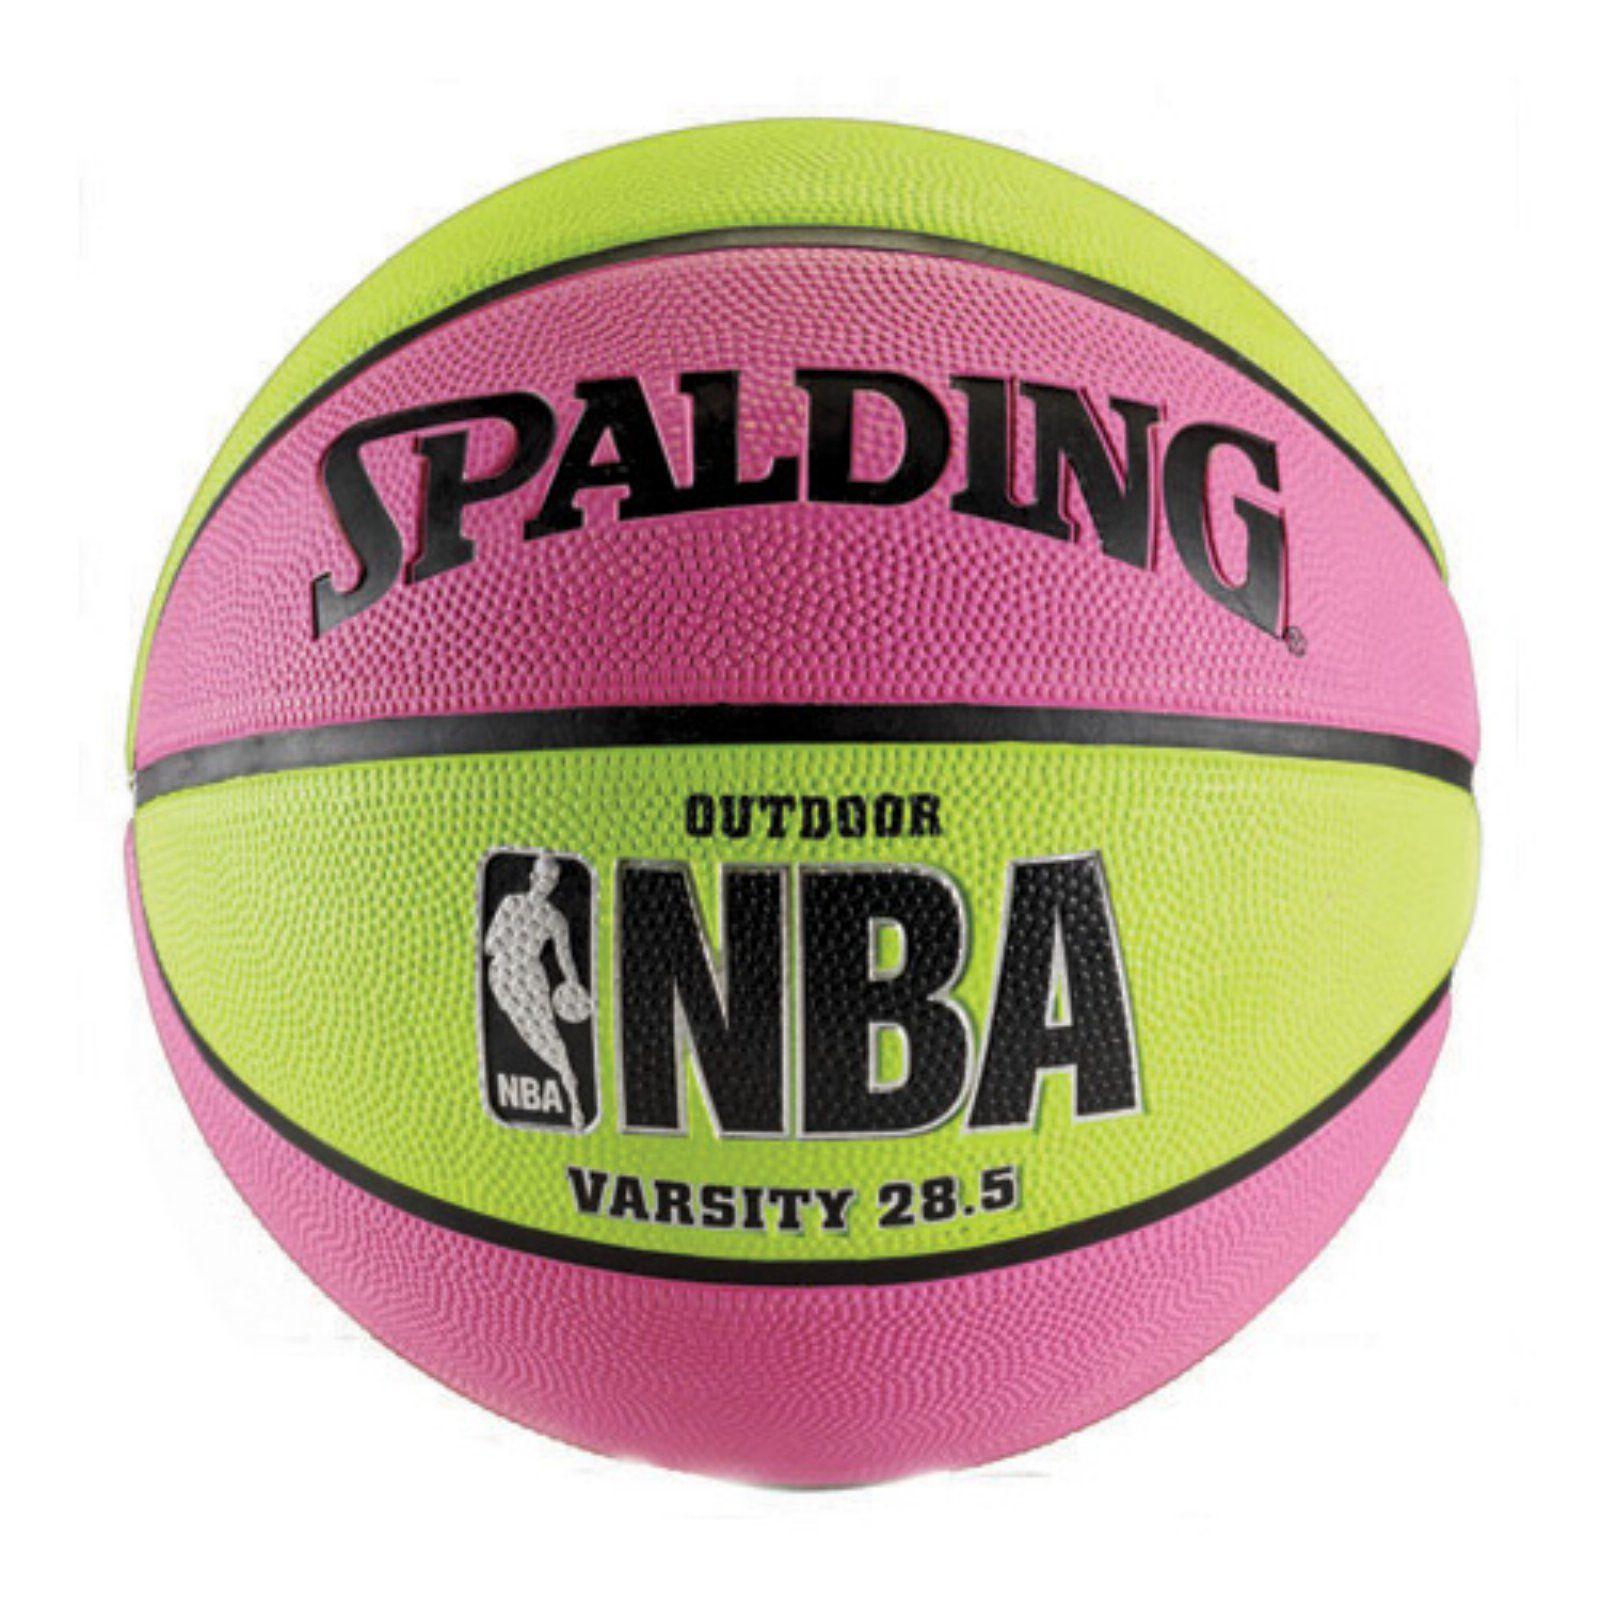 Spalding NBA Varsity Outdoor Basketball Pink Green in 2019 ... 883ac69b600b